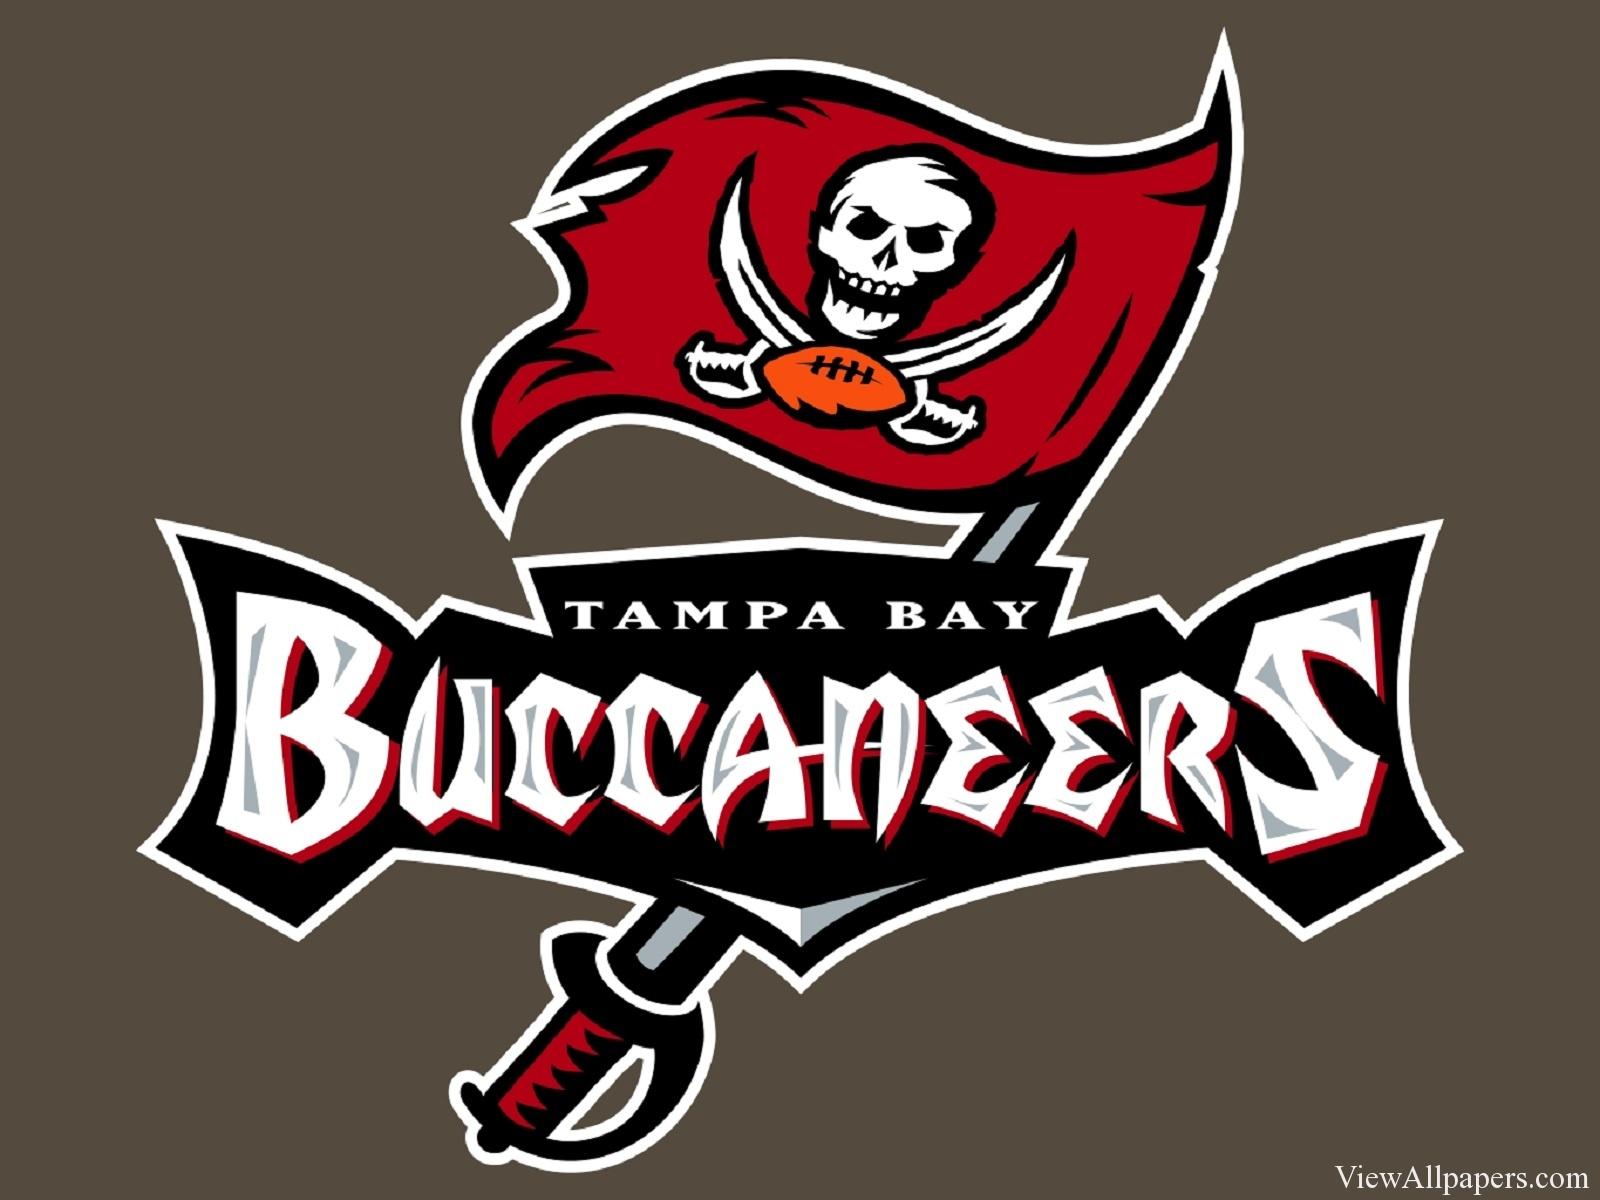 Free Download Tampa Bay Buccaneers Logo Hd Resolution Wallpaper